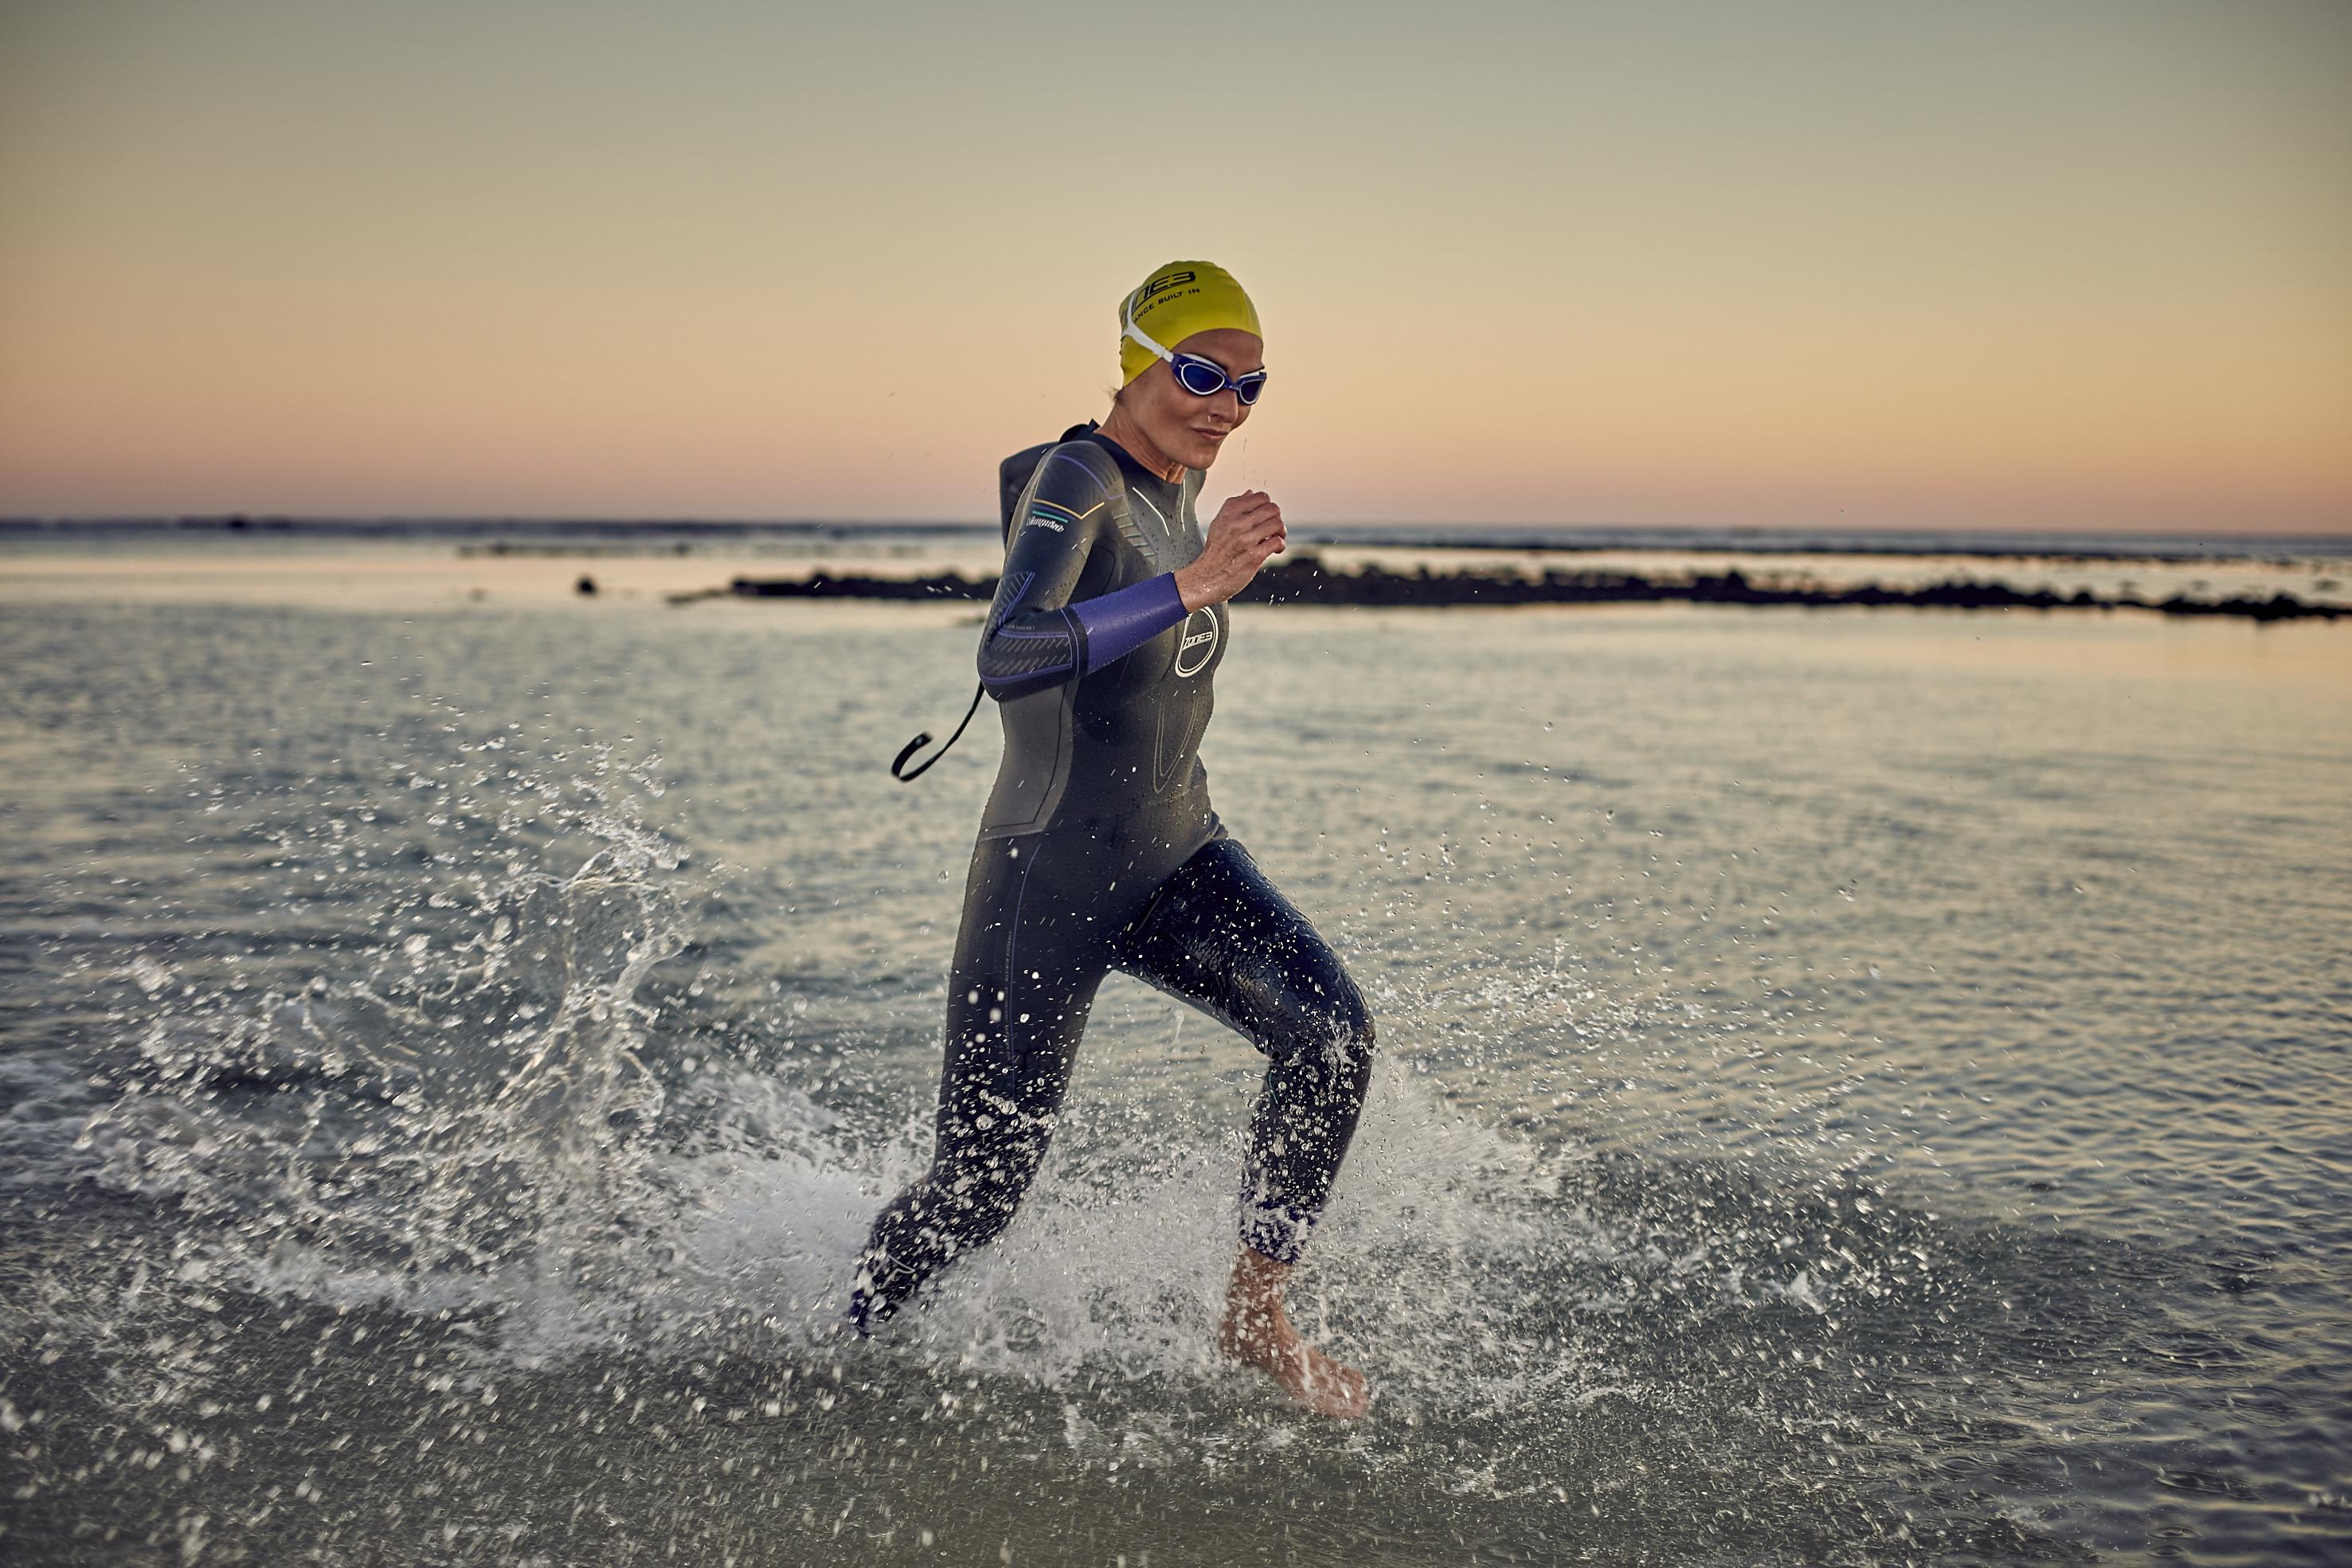 women-s-vanquish-wetsuit-lifestyle-10-.jpg